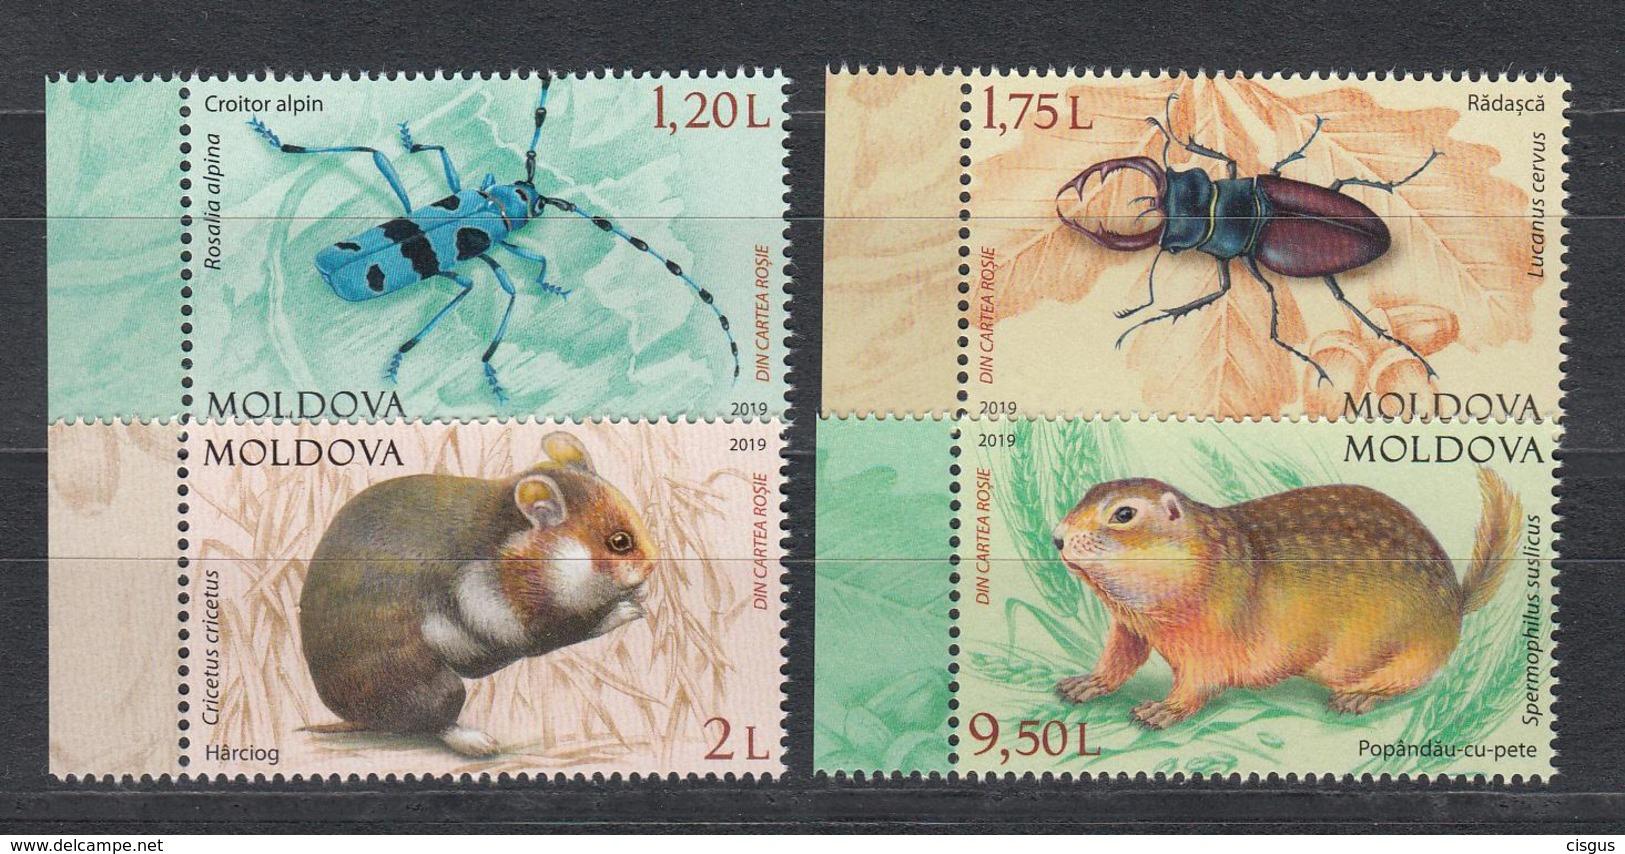 Moldova Moldawien MNH** 2019  Mi 102-95 Red Book Of Moldova Rodent & Insect - Moldawien (Moldau)